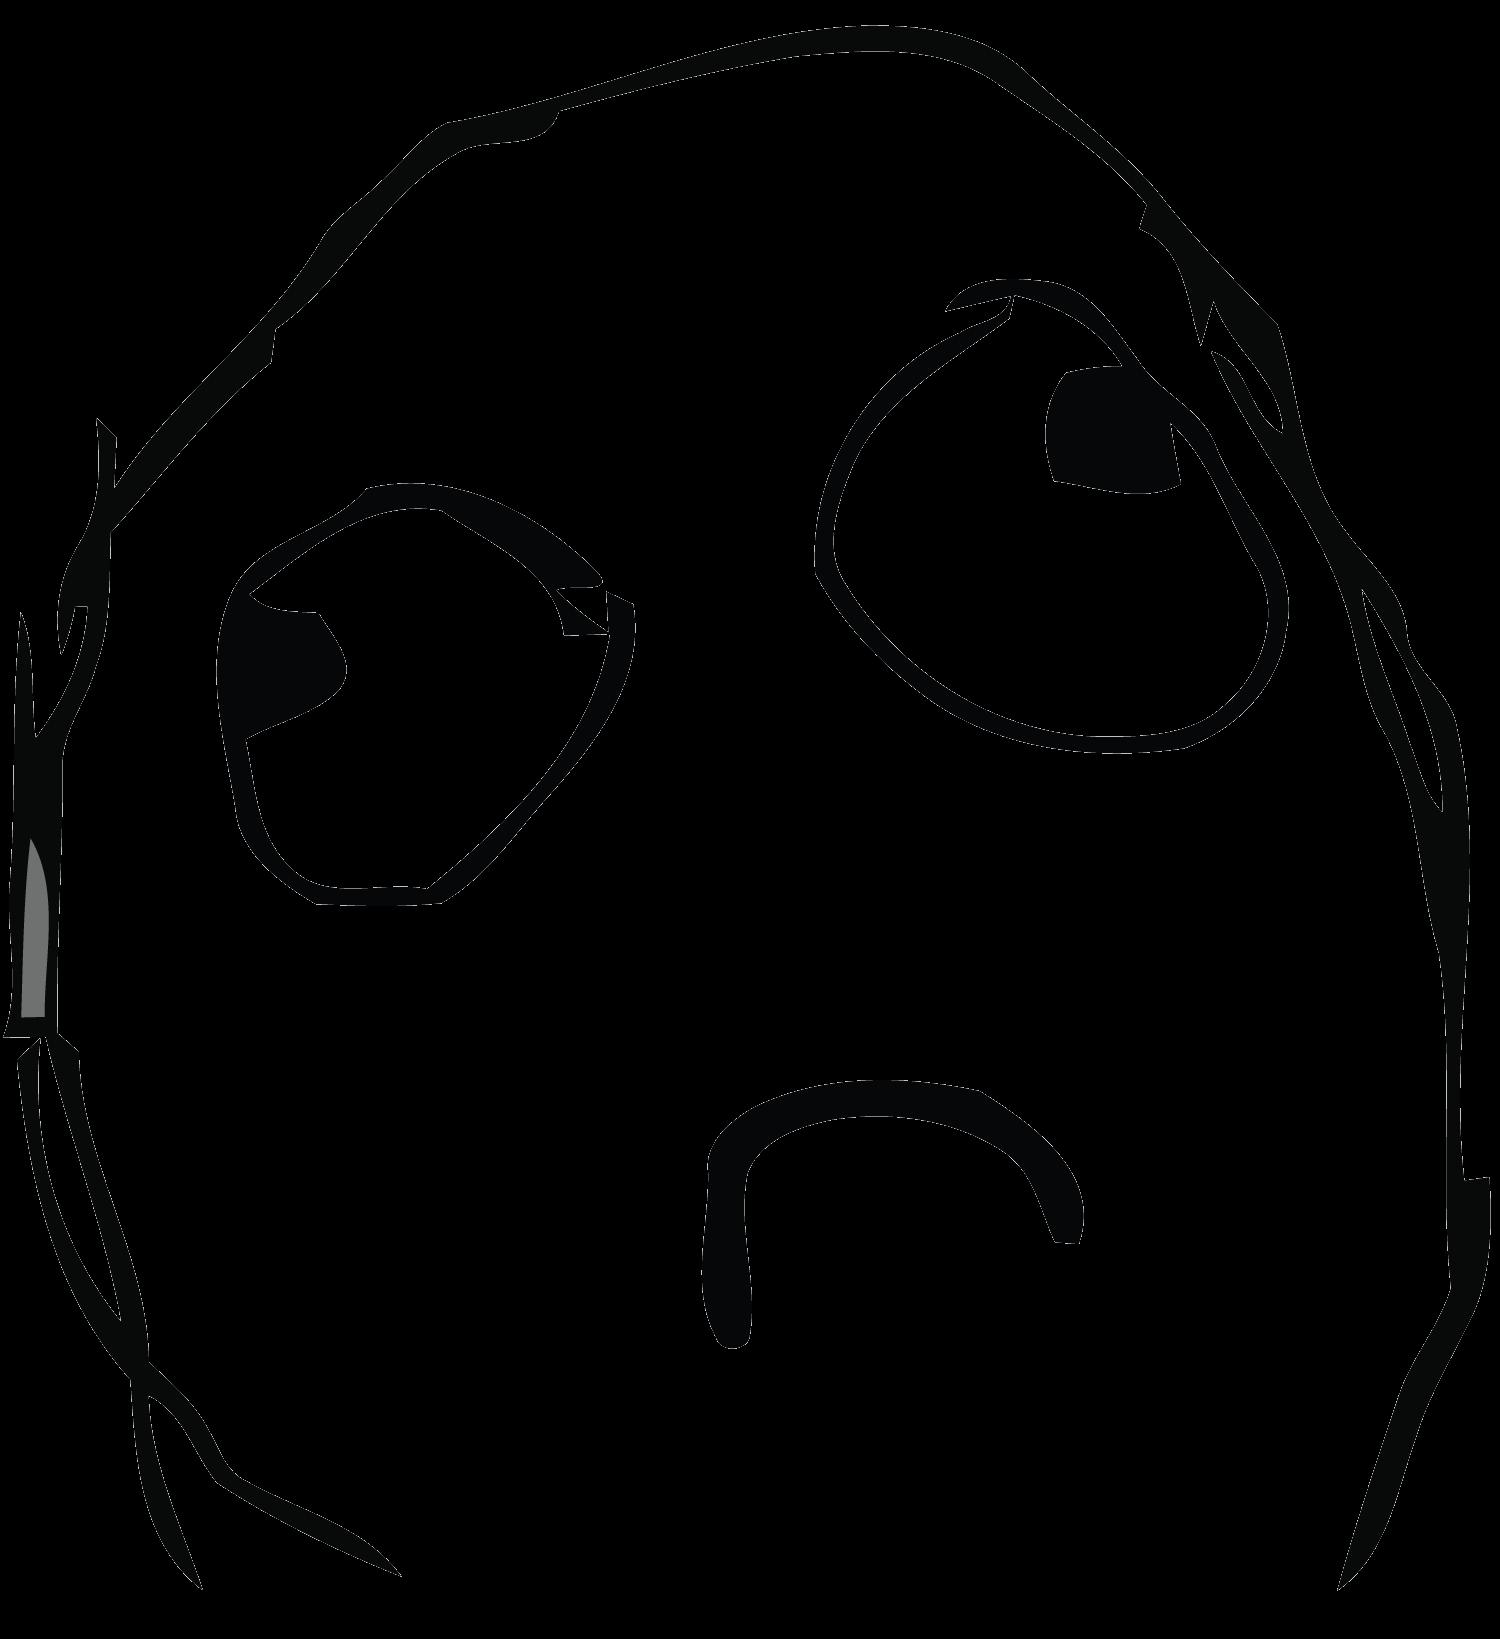 Simple Sad Troll Face Transparent Png Stickpng